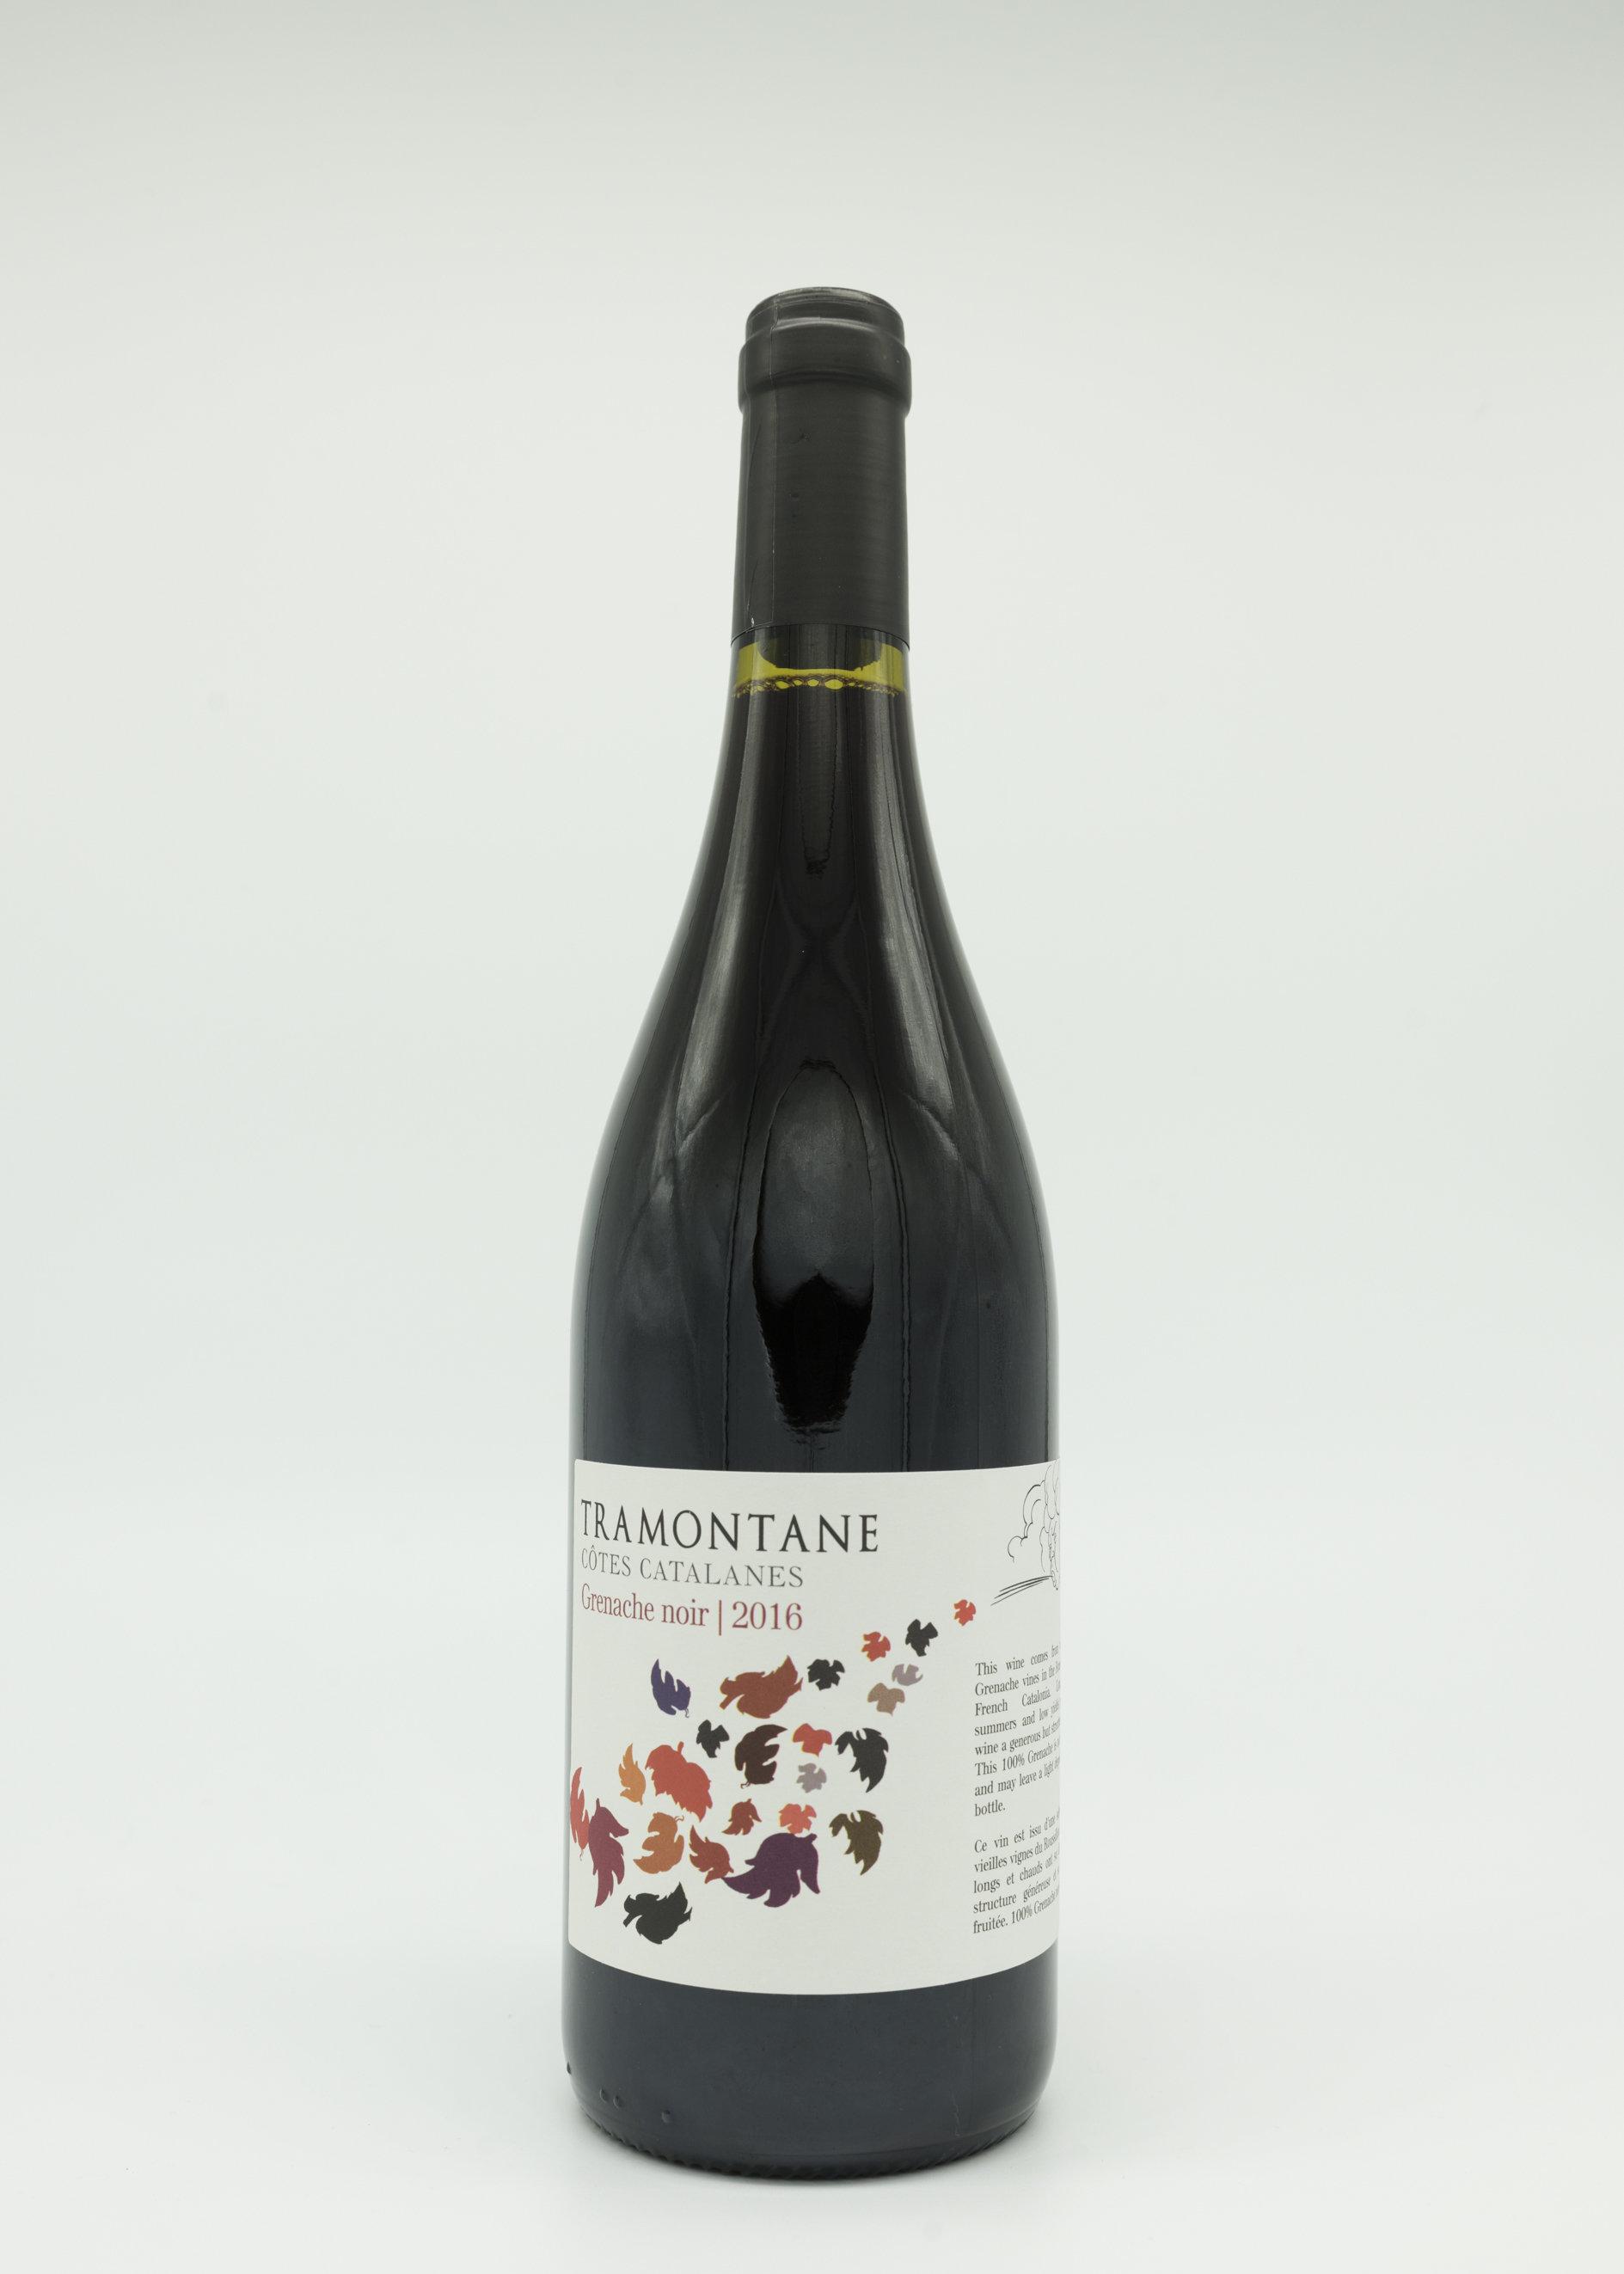 Tramontane Grenache, 2017, Tramontane Wines 00019